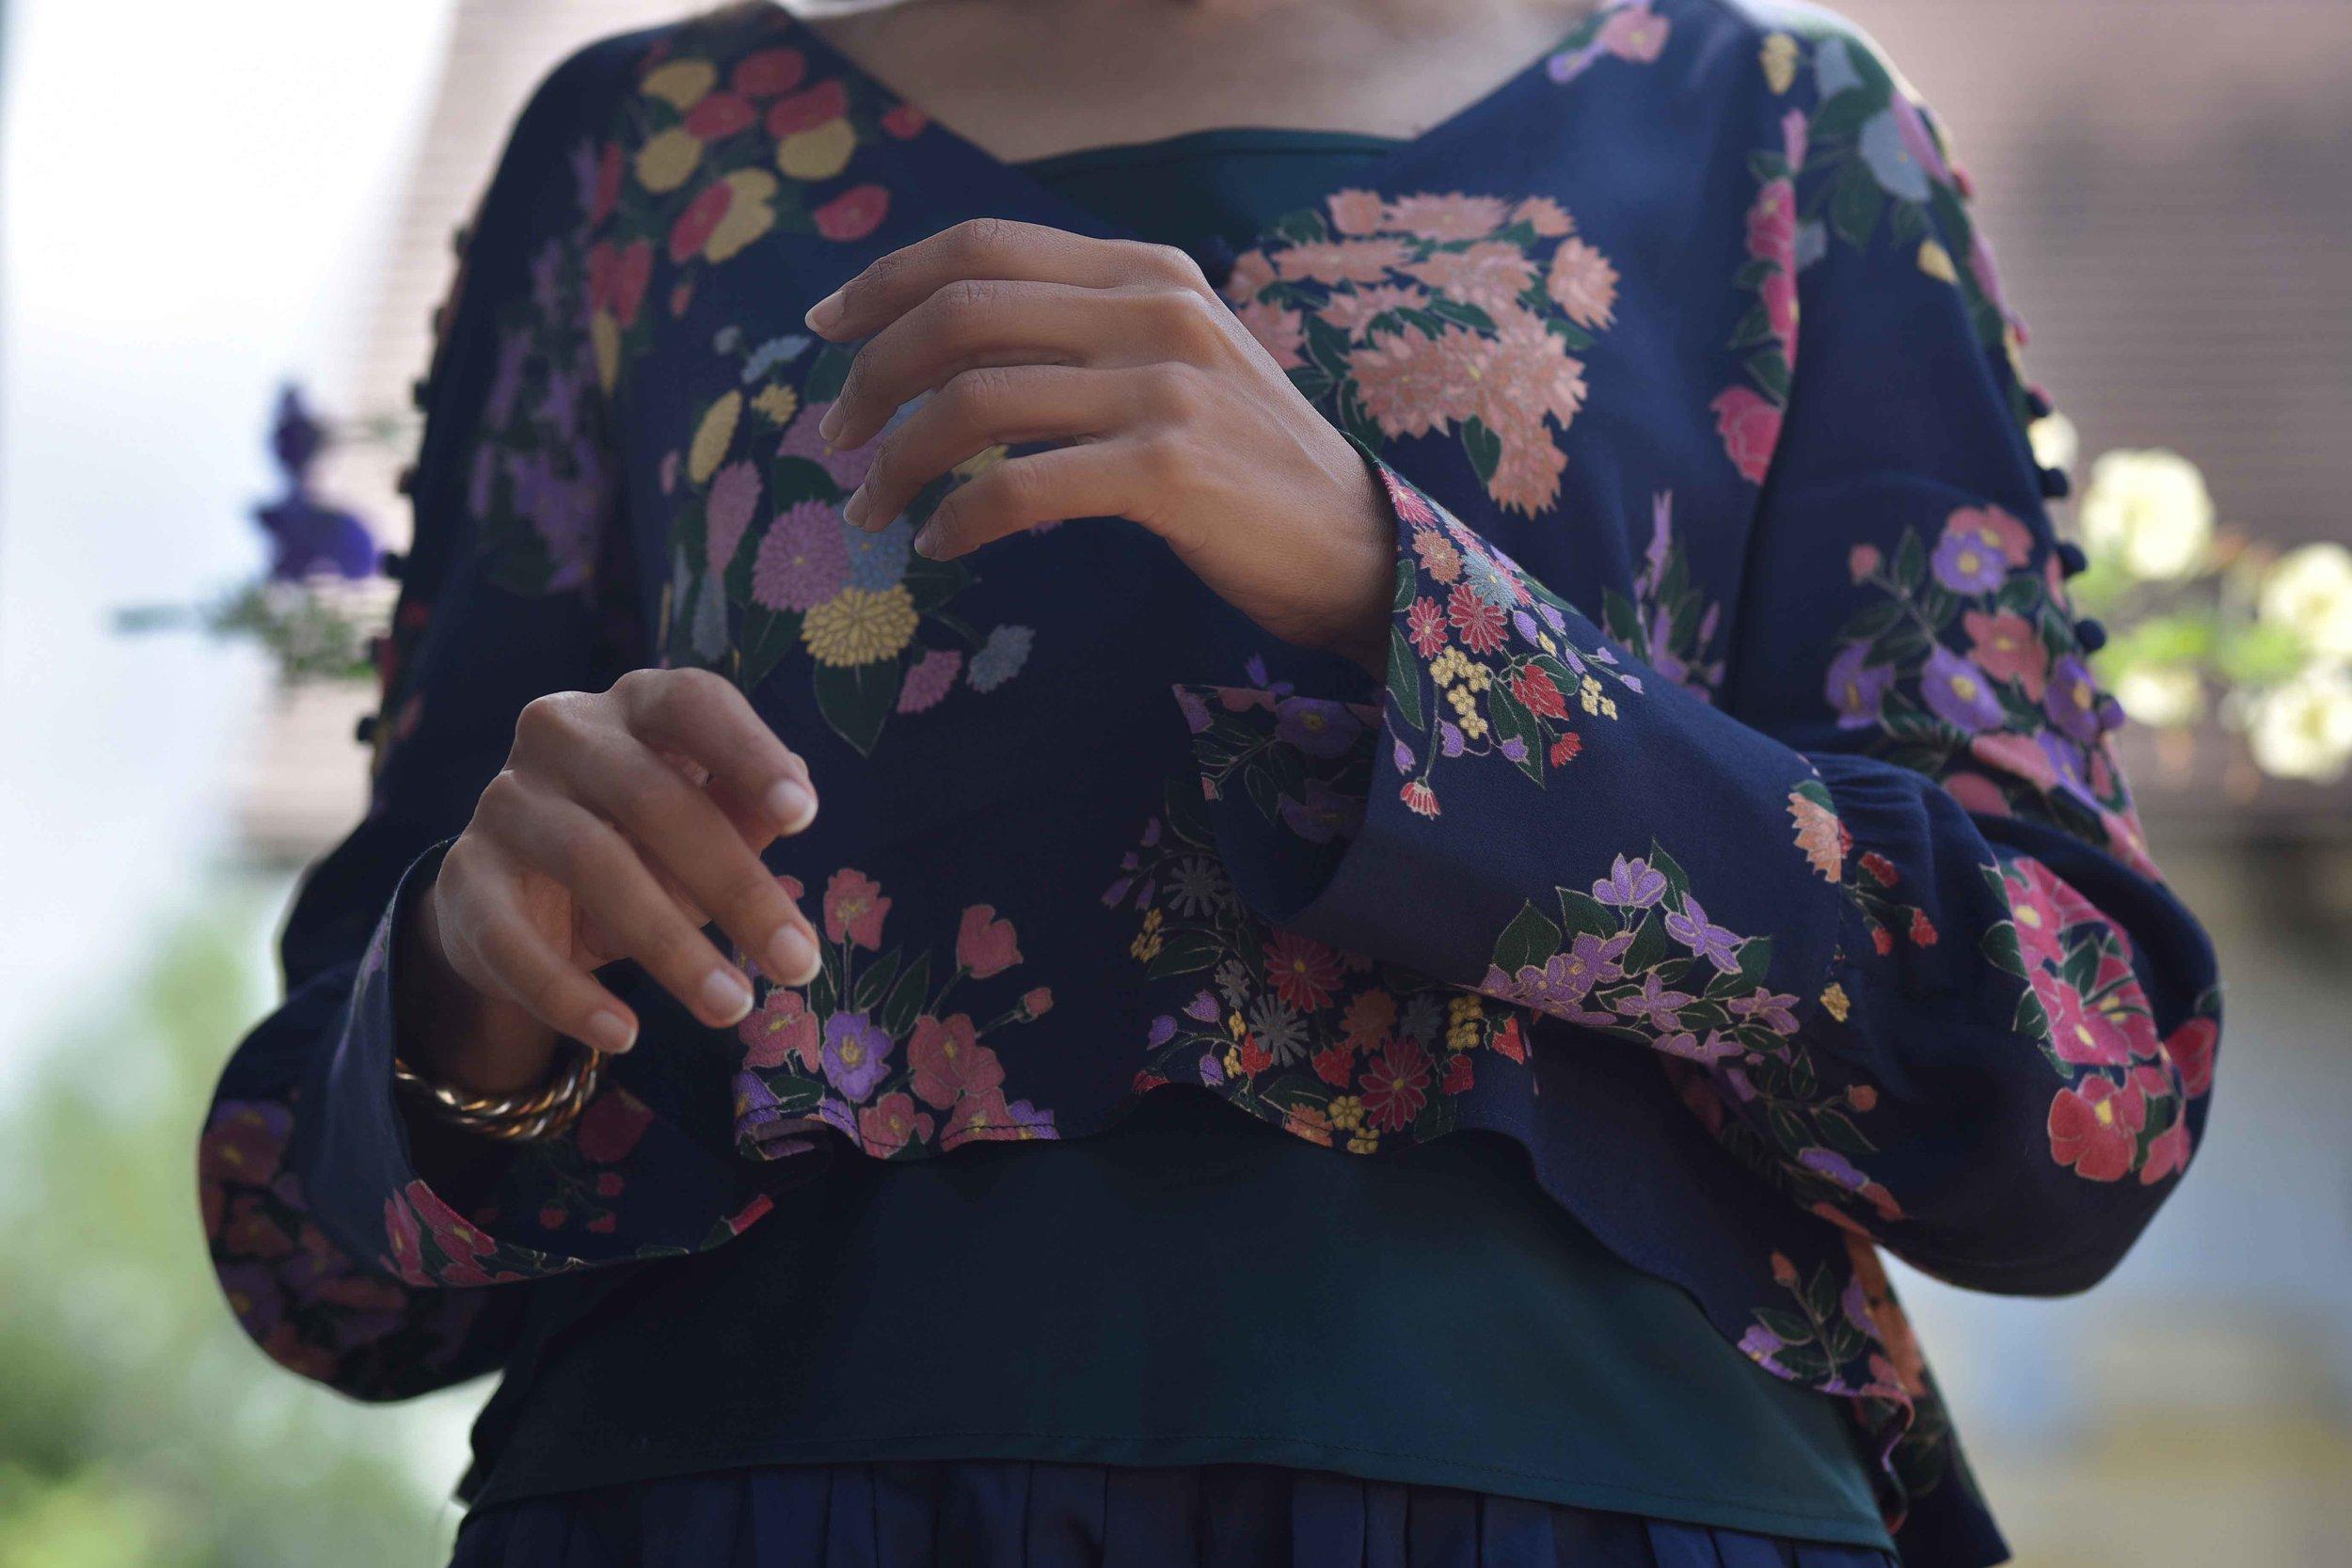 Zara floral top, Talbots silk camisole. Image©sourcingstyle.com